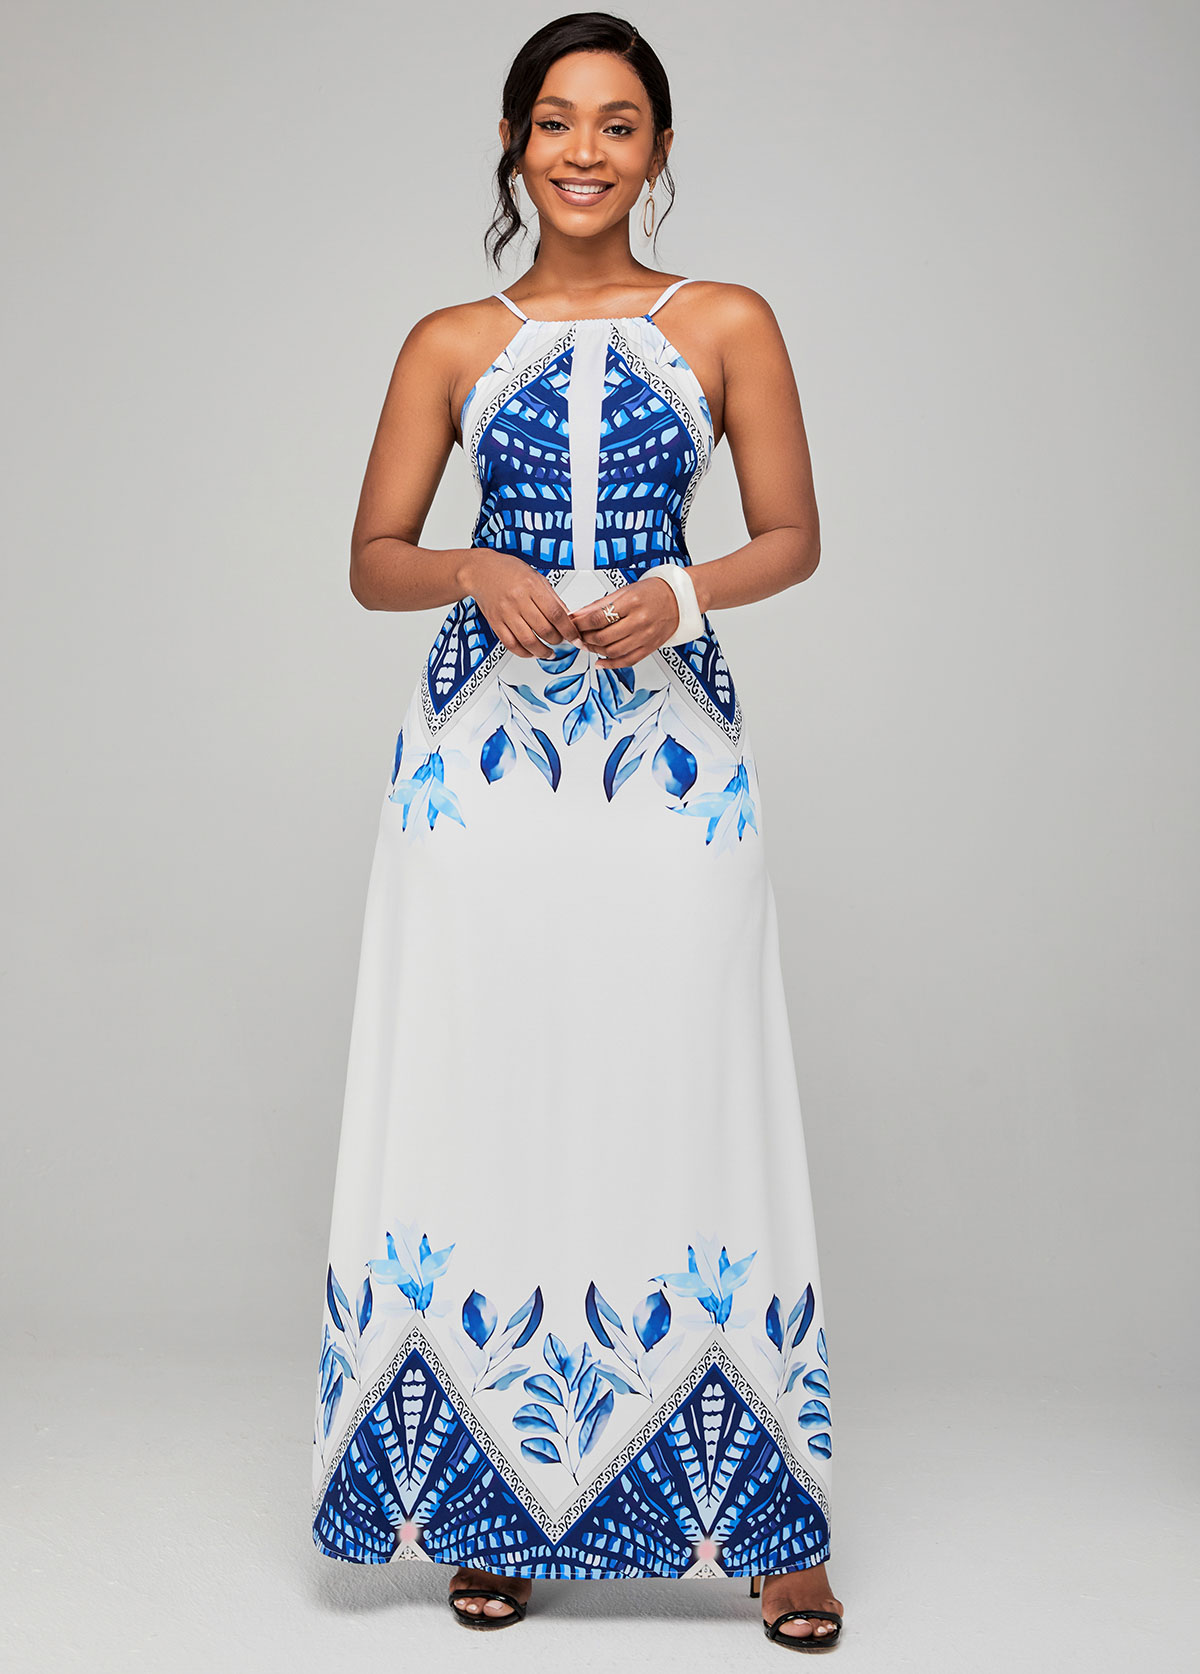 ROTITA Spaghetti Strap Tribal Print High Waist Dress